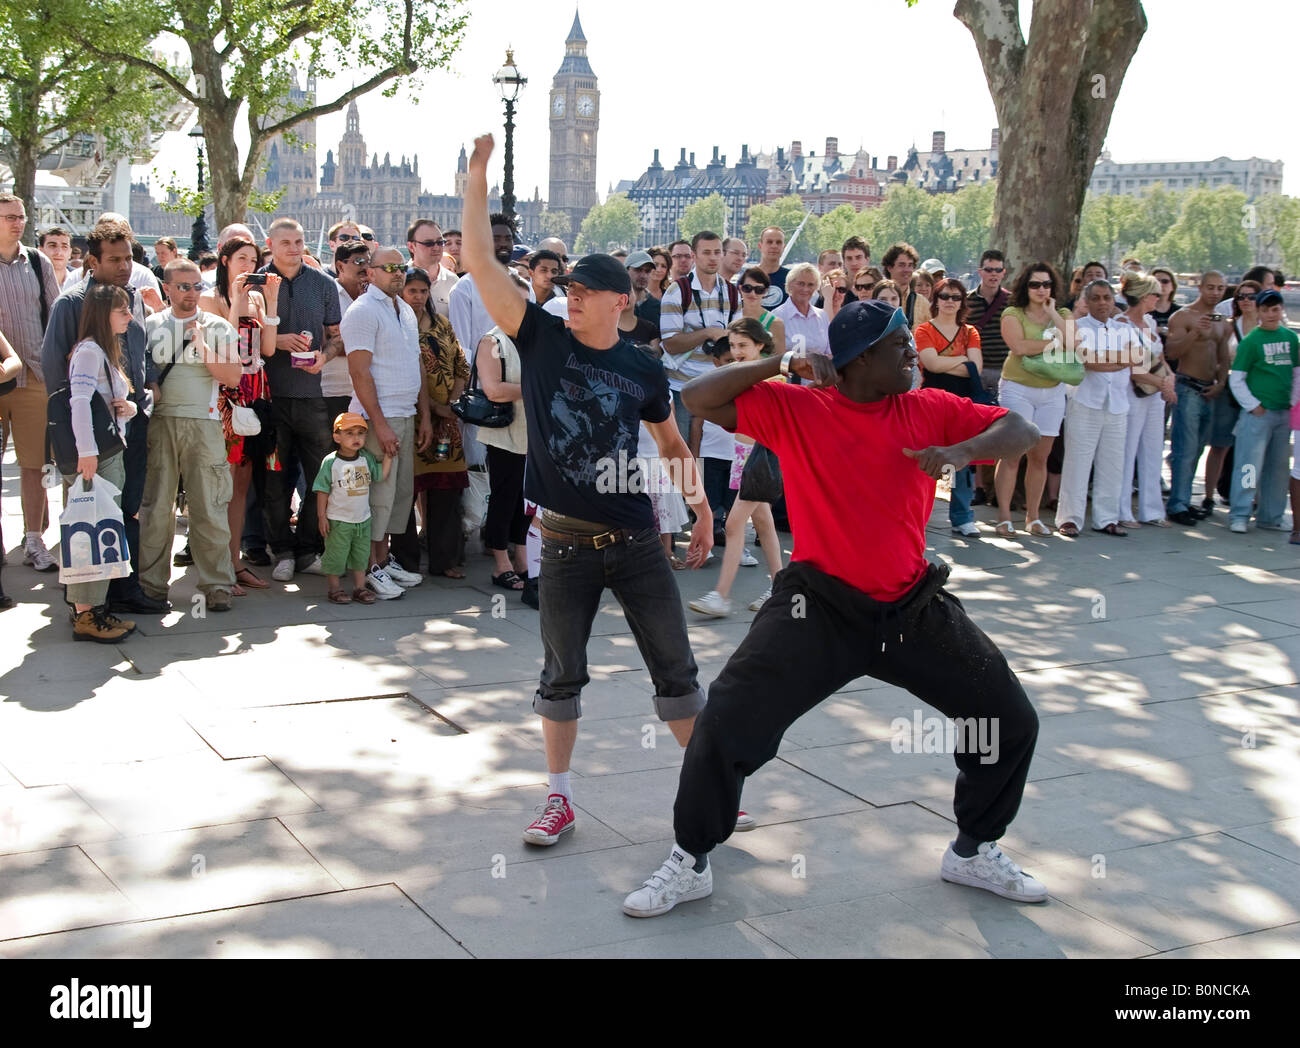 Street performers, London embankment - Stock Image